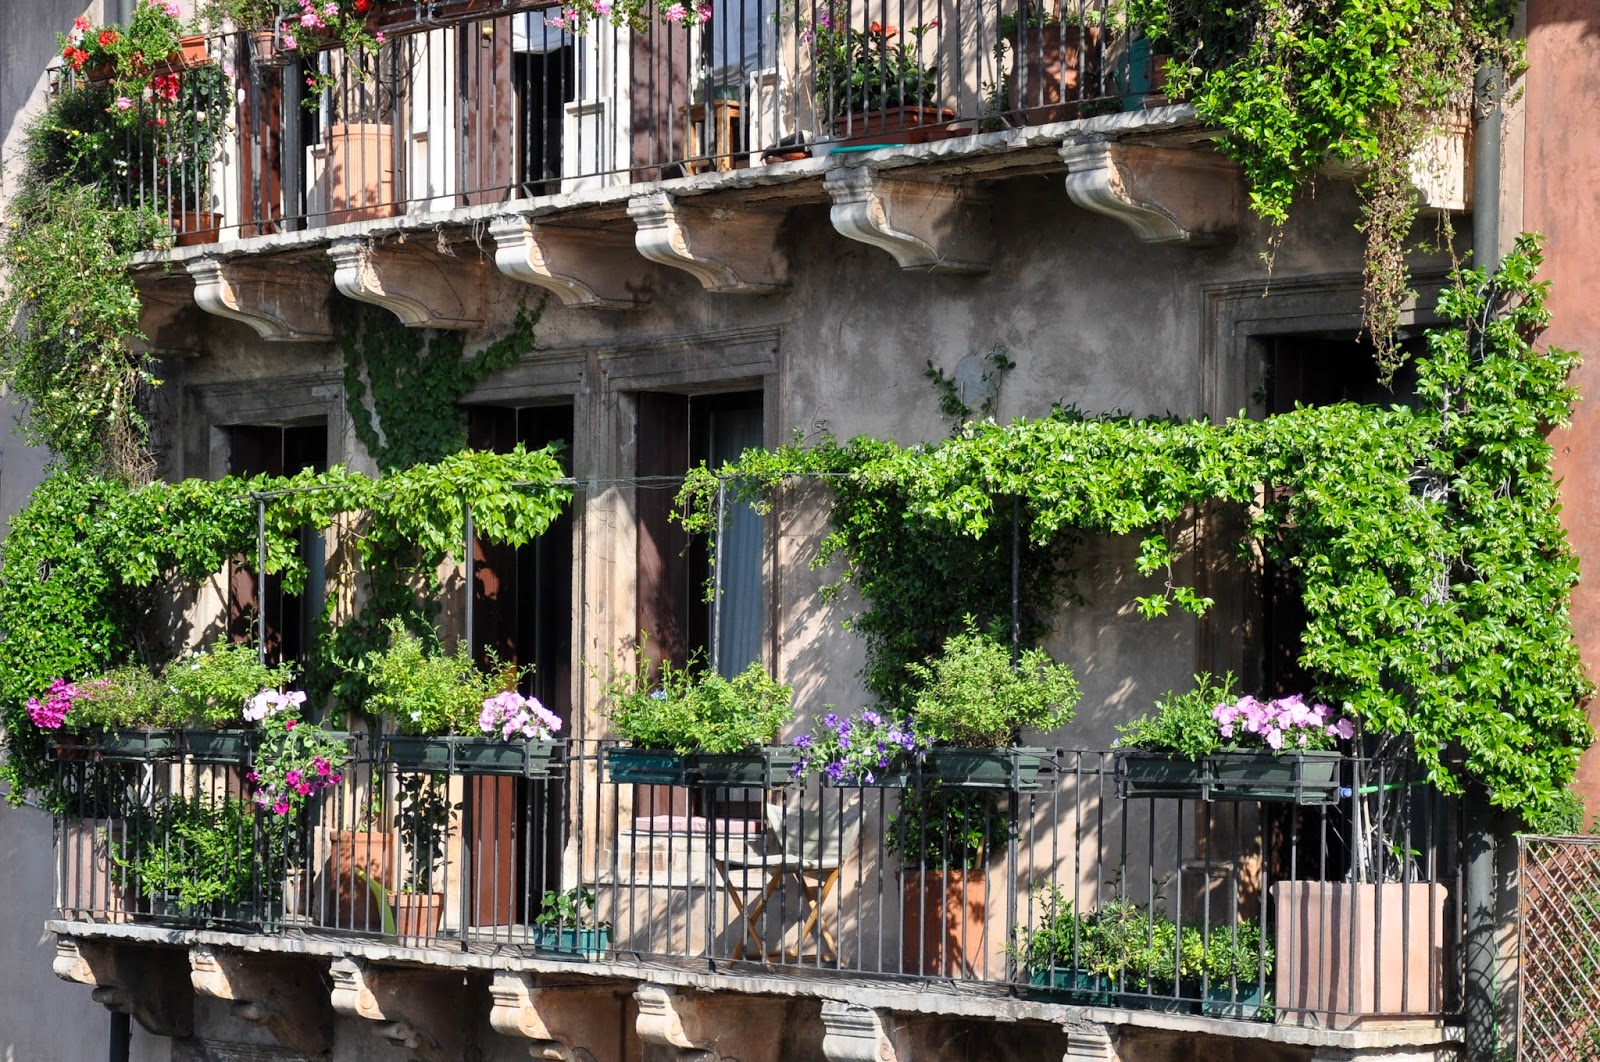 A balcony draped with greenery in Vicenza, Italy